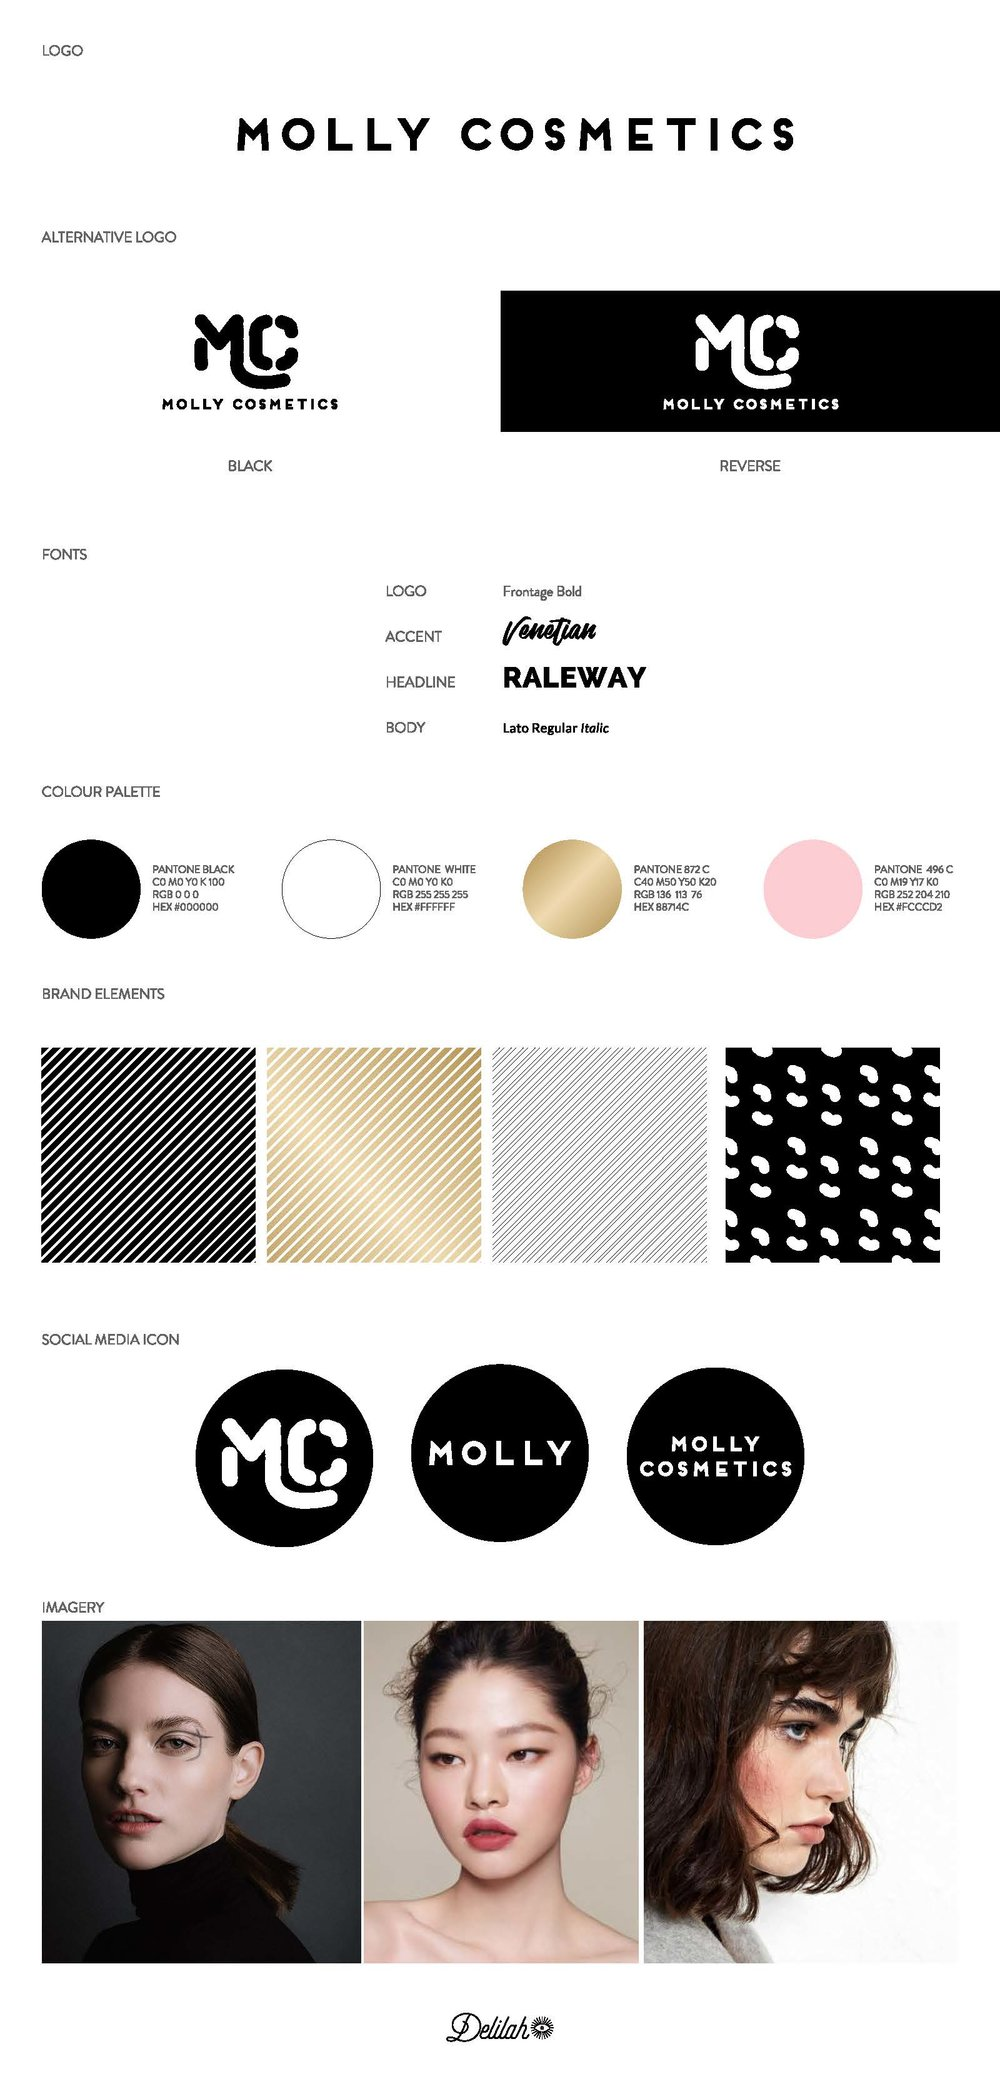 Delilah_Molly Cosmetics Brand Toolkit_v2.jpg